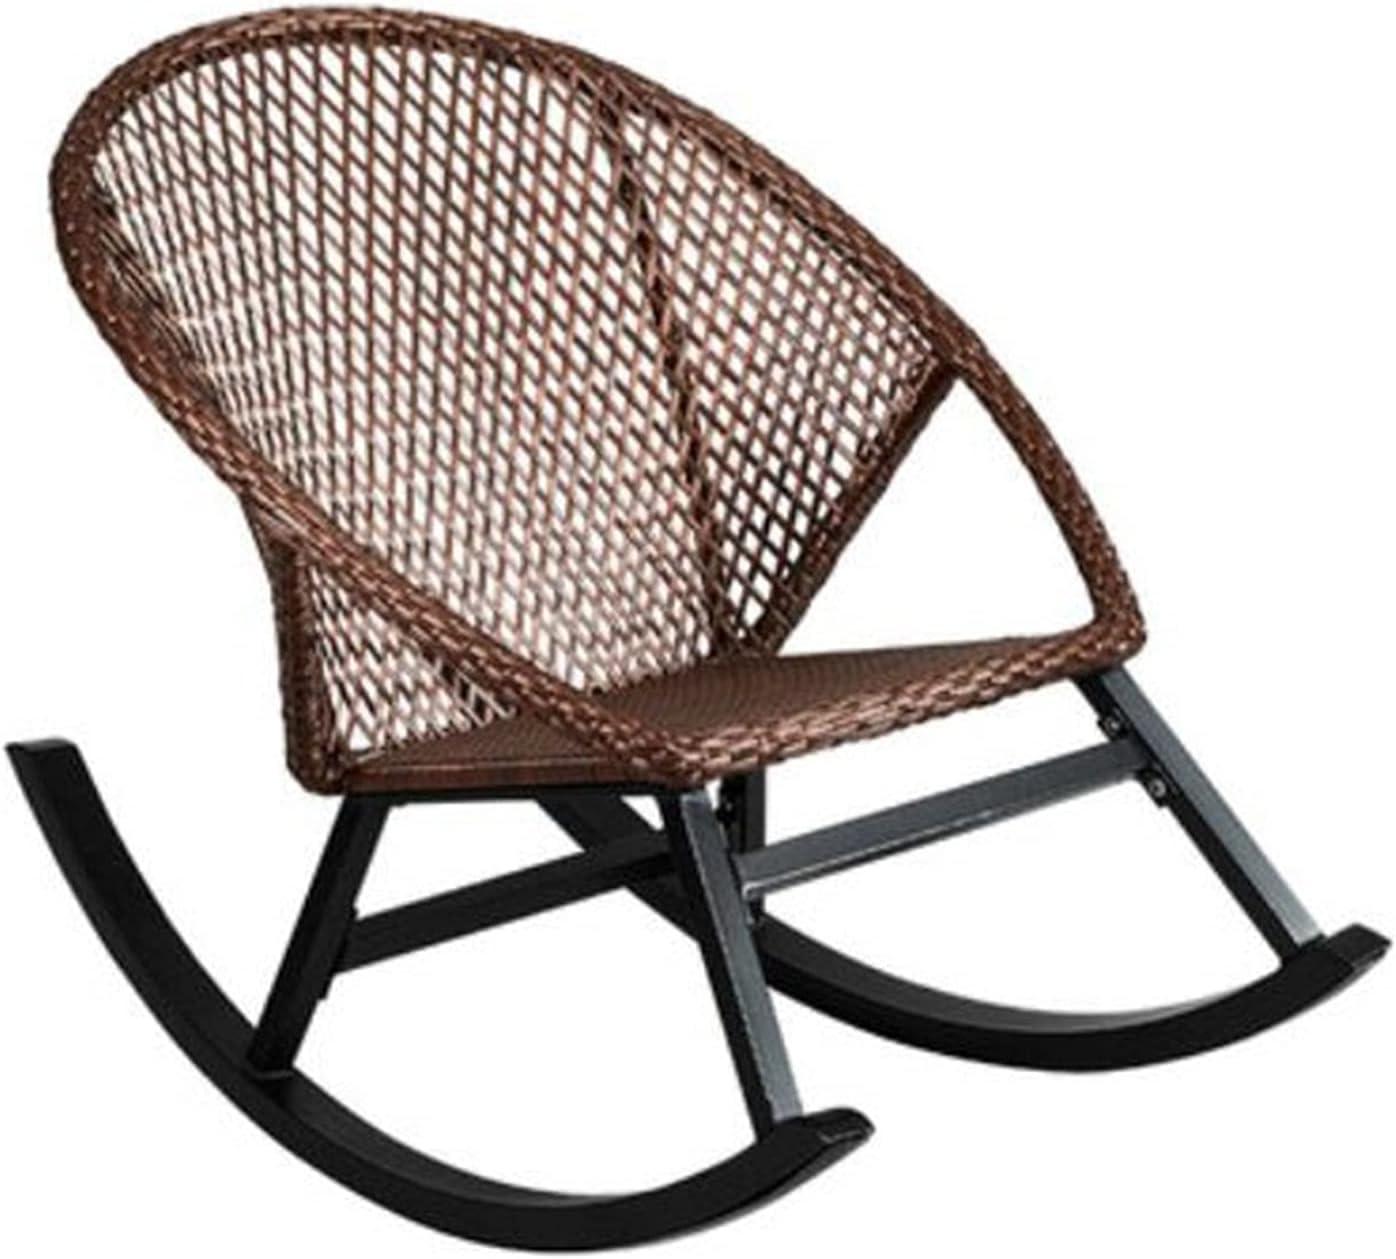 Domestic Rattan Classic Chair Boston Mall Single Rocking Balcony Sofa Suita